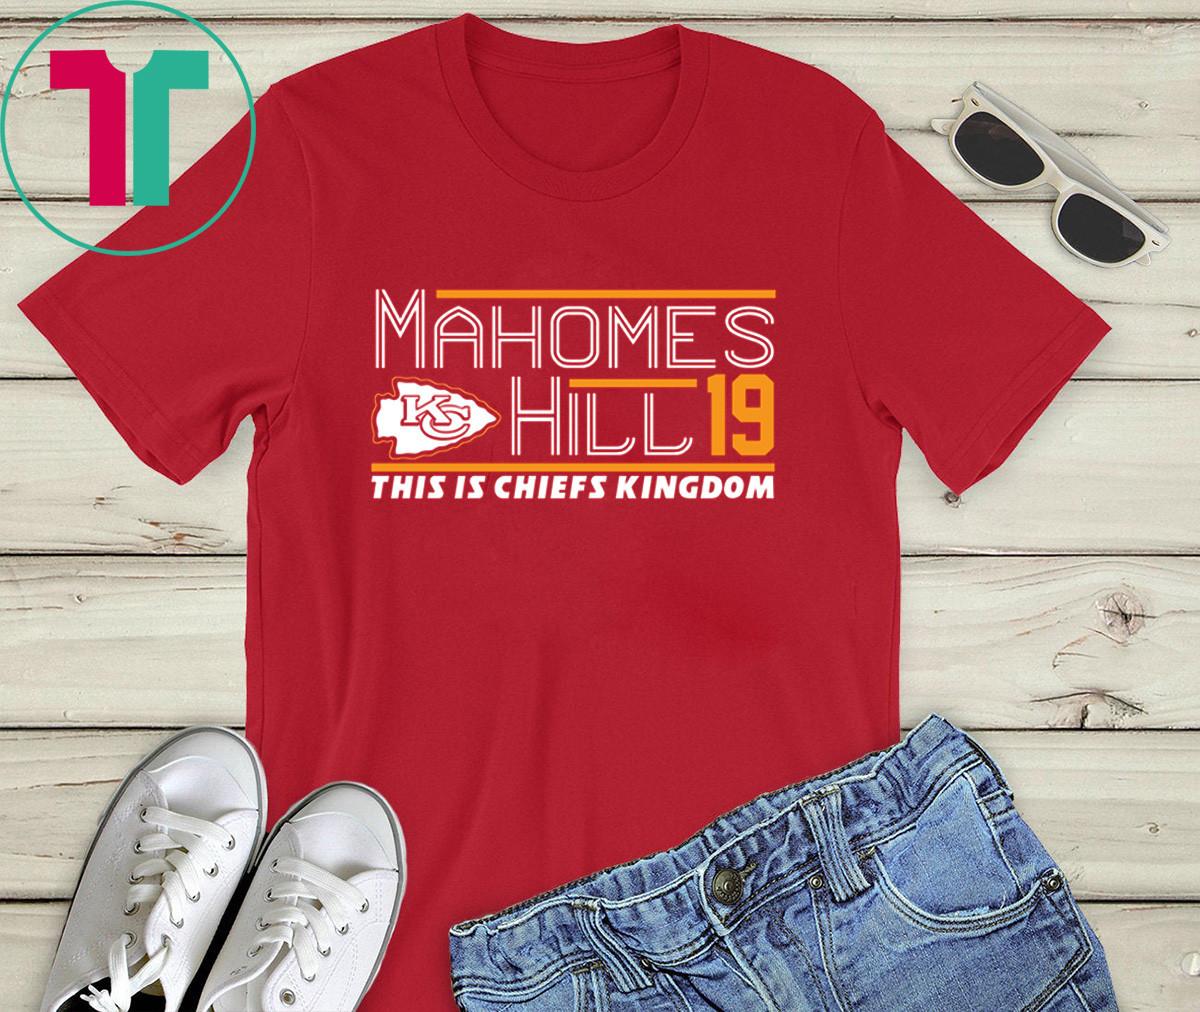 Patrick Mahomes Tyreek Hill 2020 T-Shirt KC Chiefs Pat Chiefs Kingdom